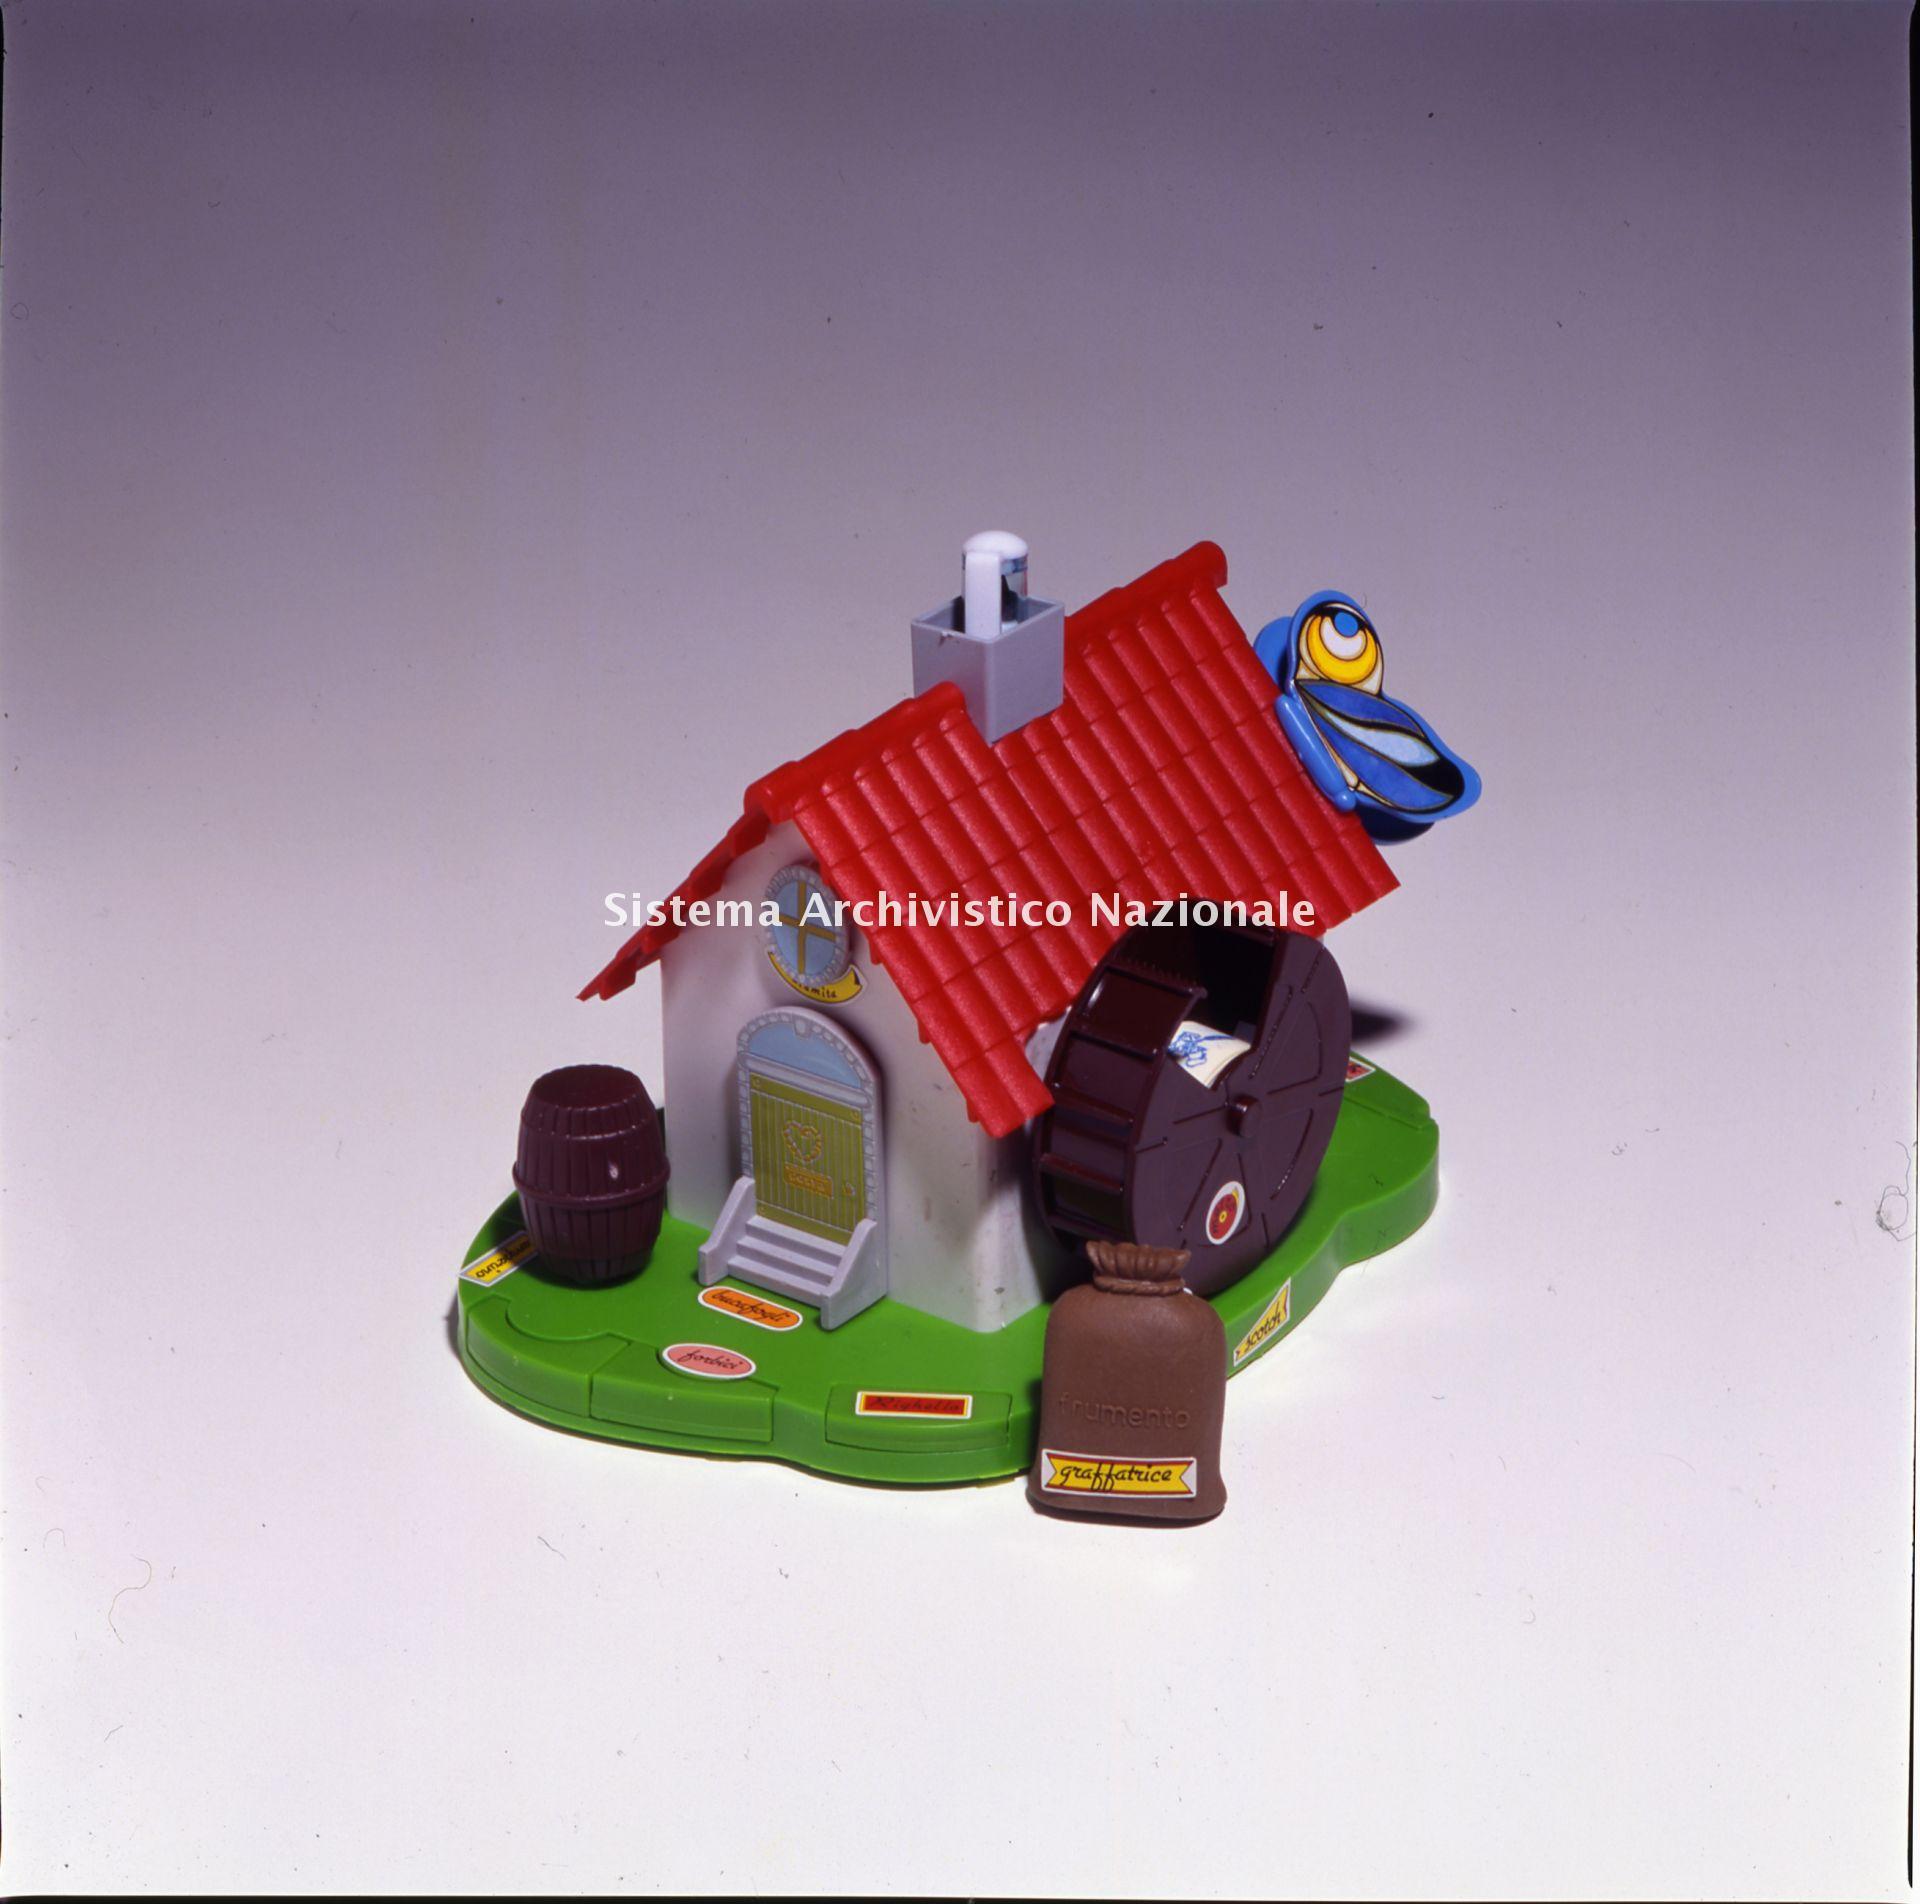 Barilla, Mulino Bianco, 1990